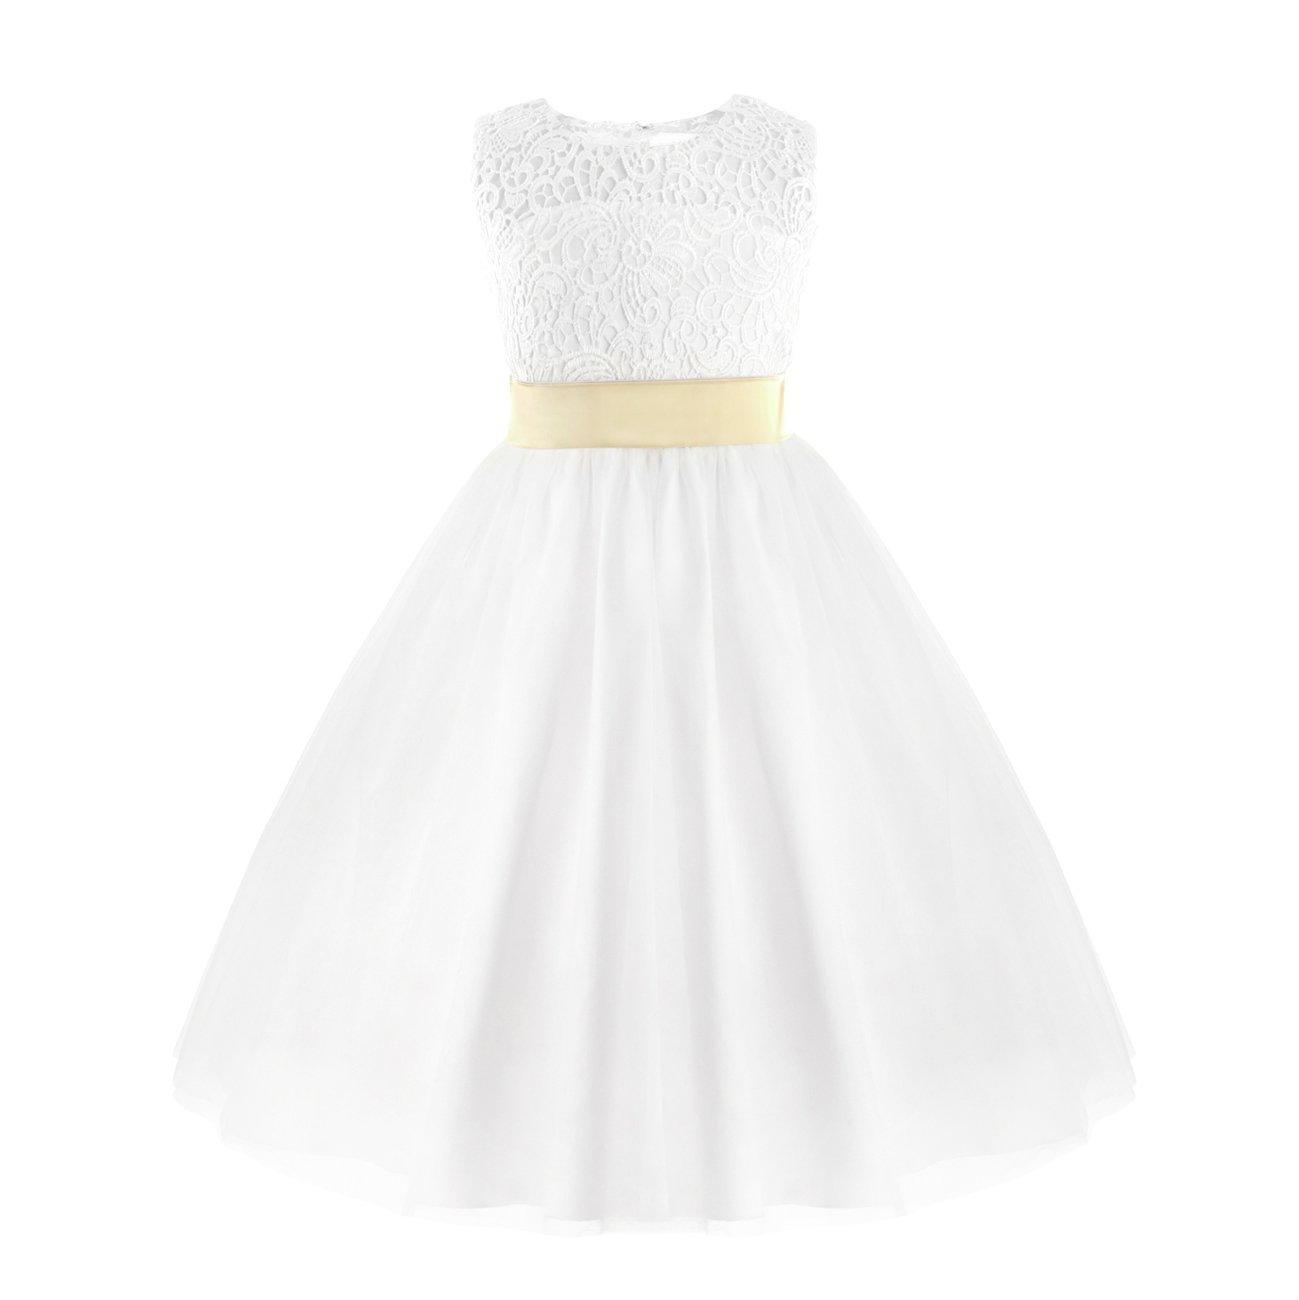 Alvivi Kids Girls Princess Wedding Birthday Party Ball Gown Heart Cutout Back Christening Flower Girl Dress White 4